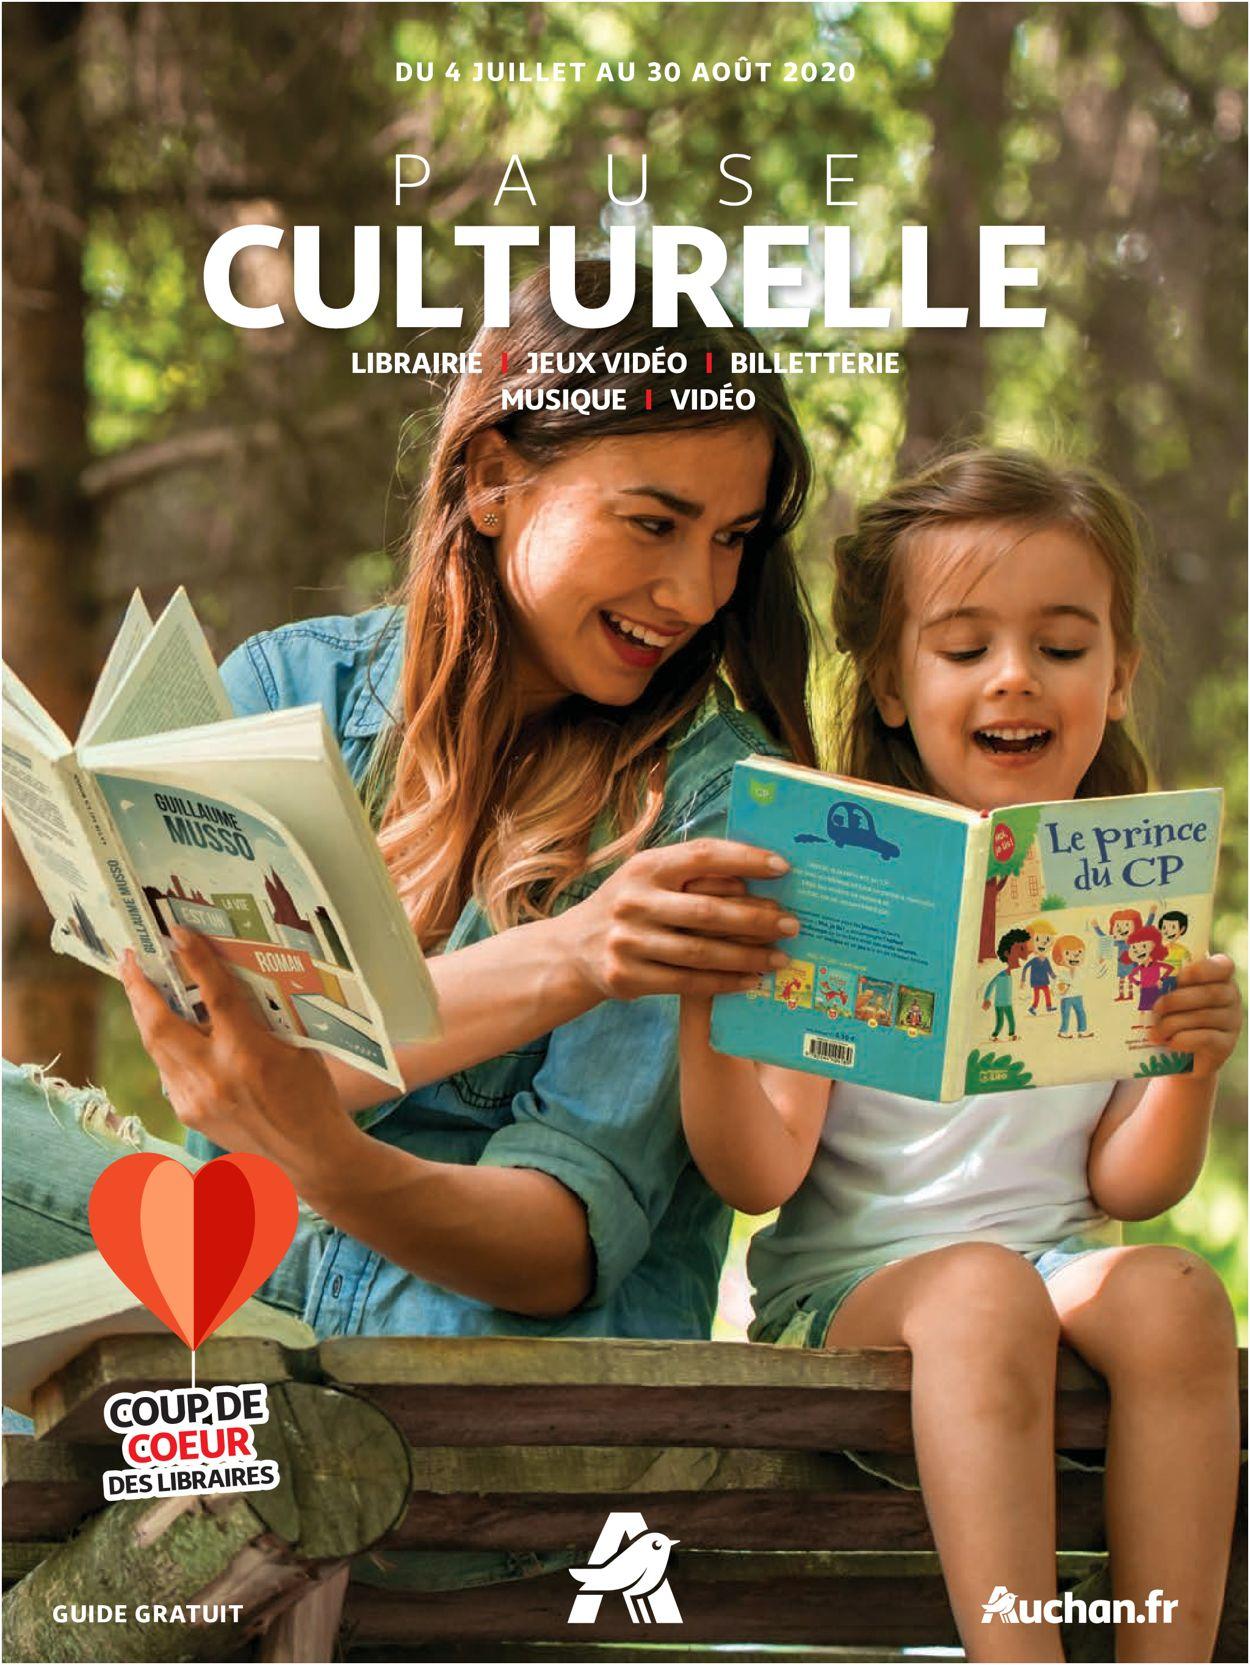 Auchan Catalogue - 04.07-30.08.2020